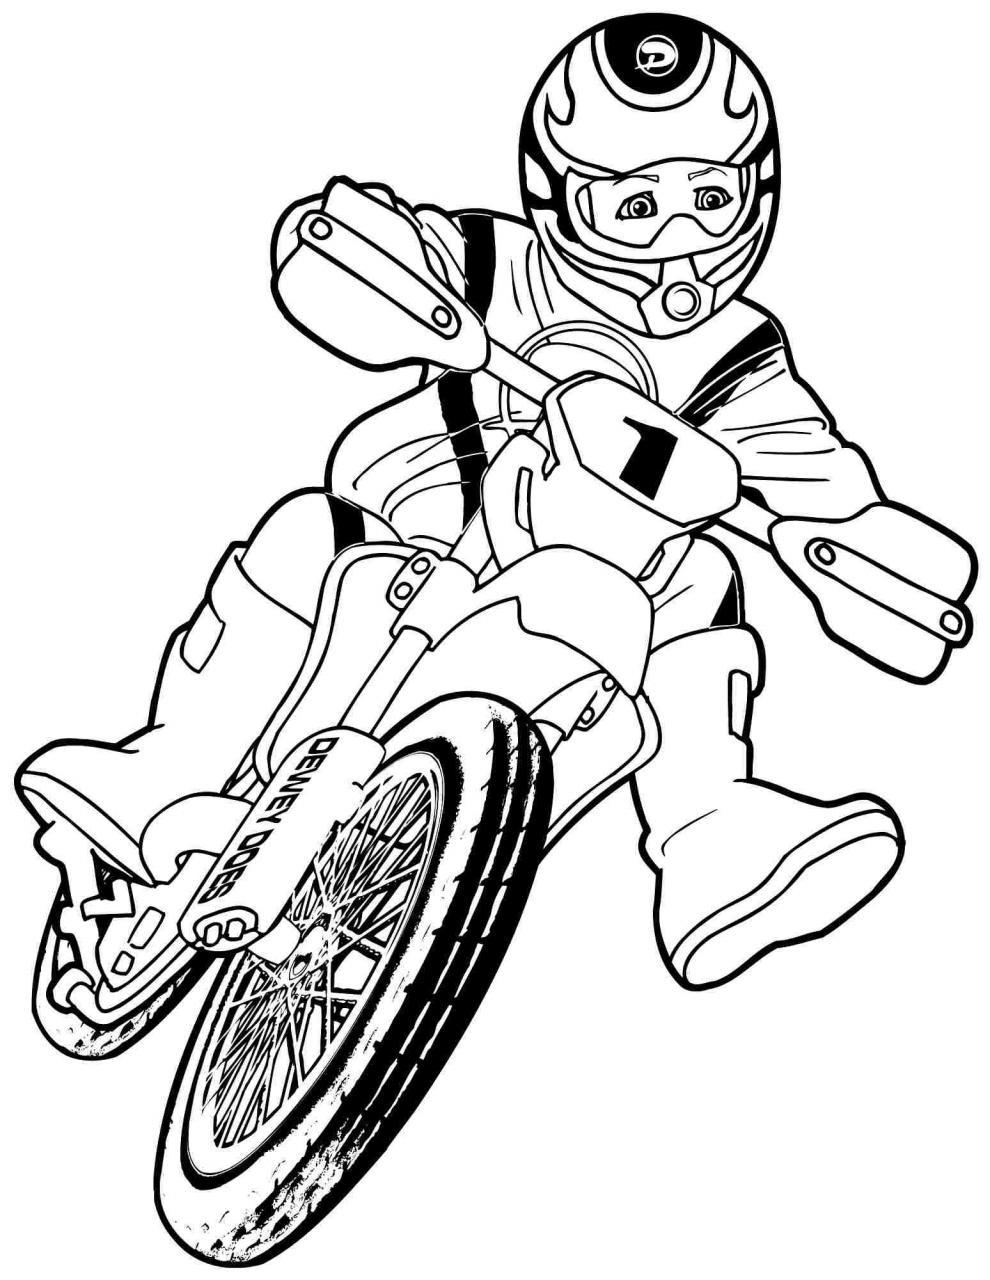 bé lái xe máy